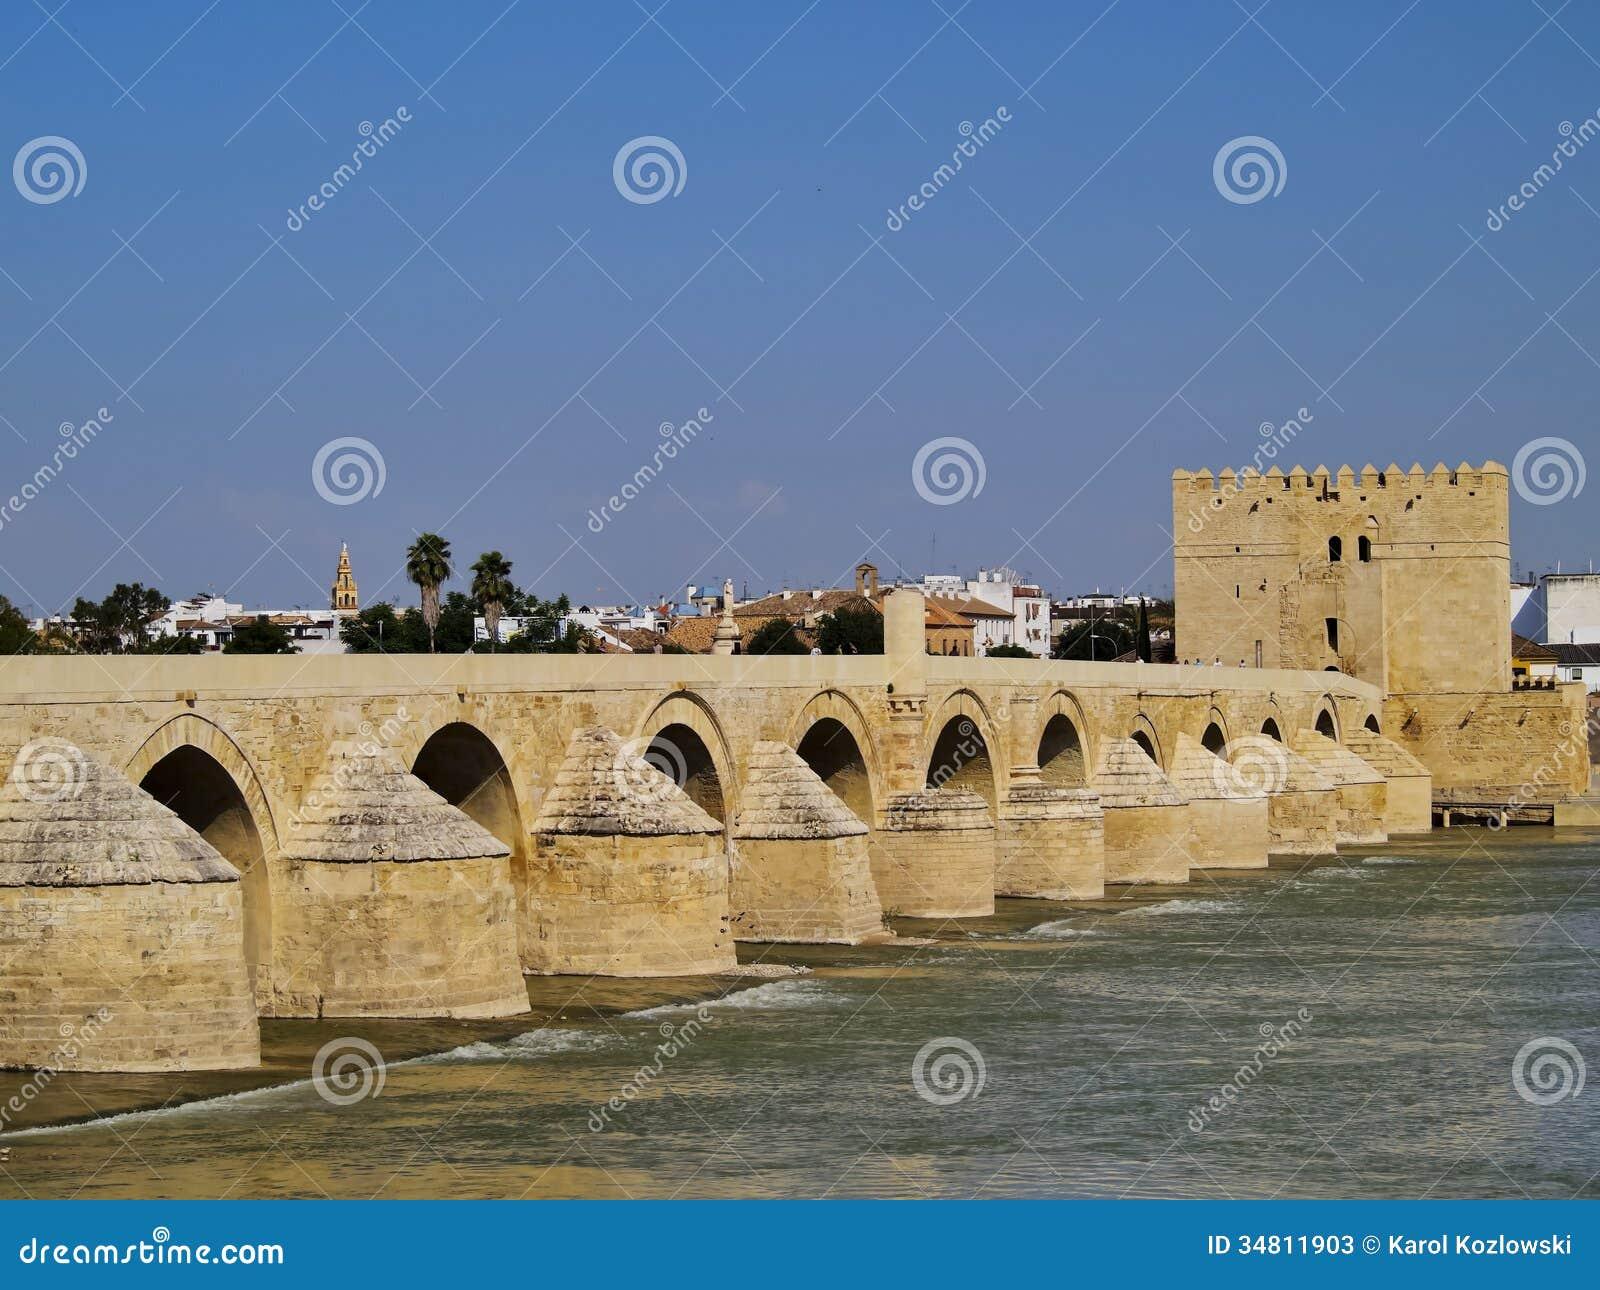 The Roman Bridge In Cordoba, Spain Stock Photos - Image: 34811903